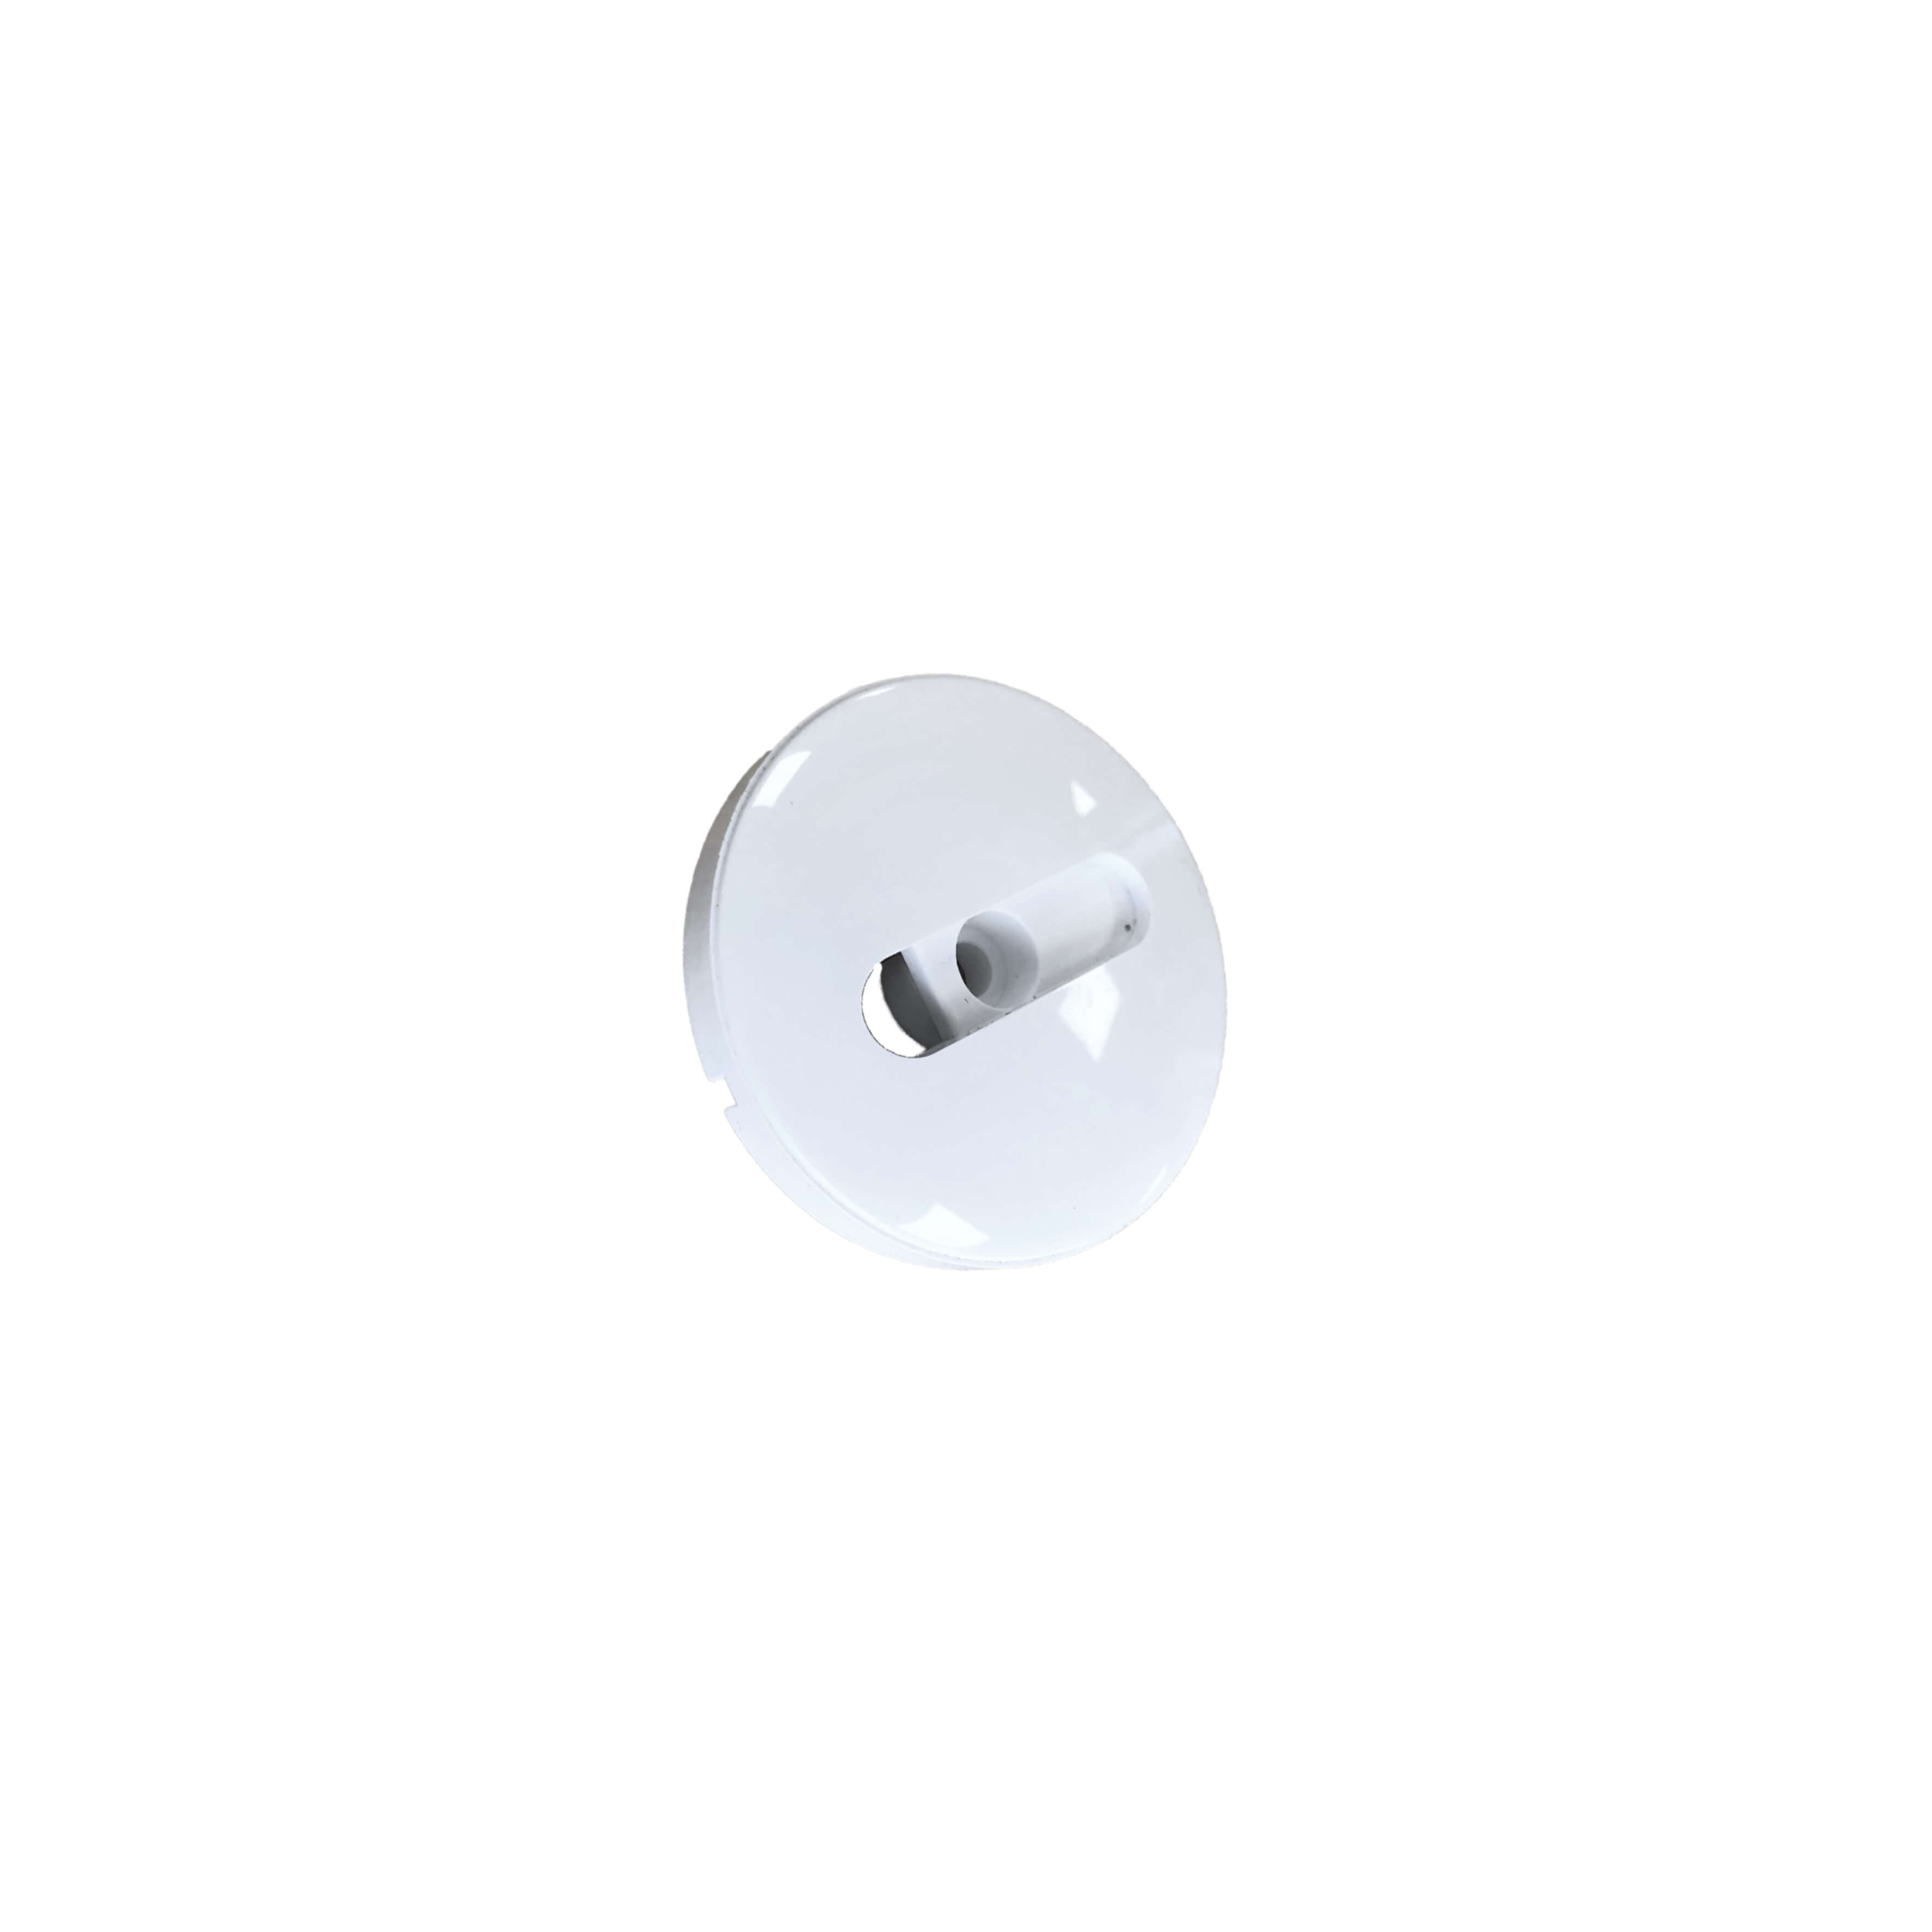 Aqualisa 213026 Cover White